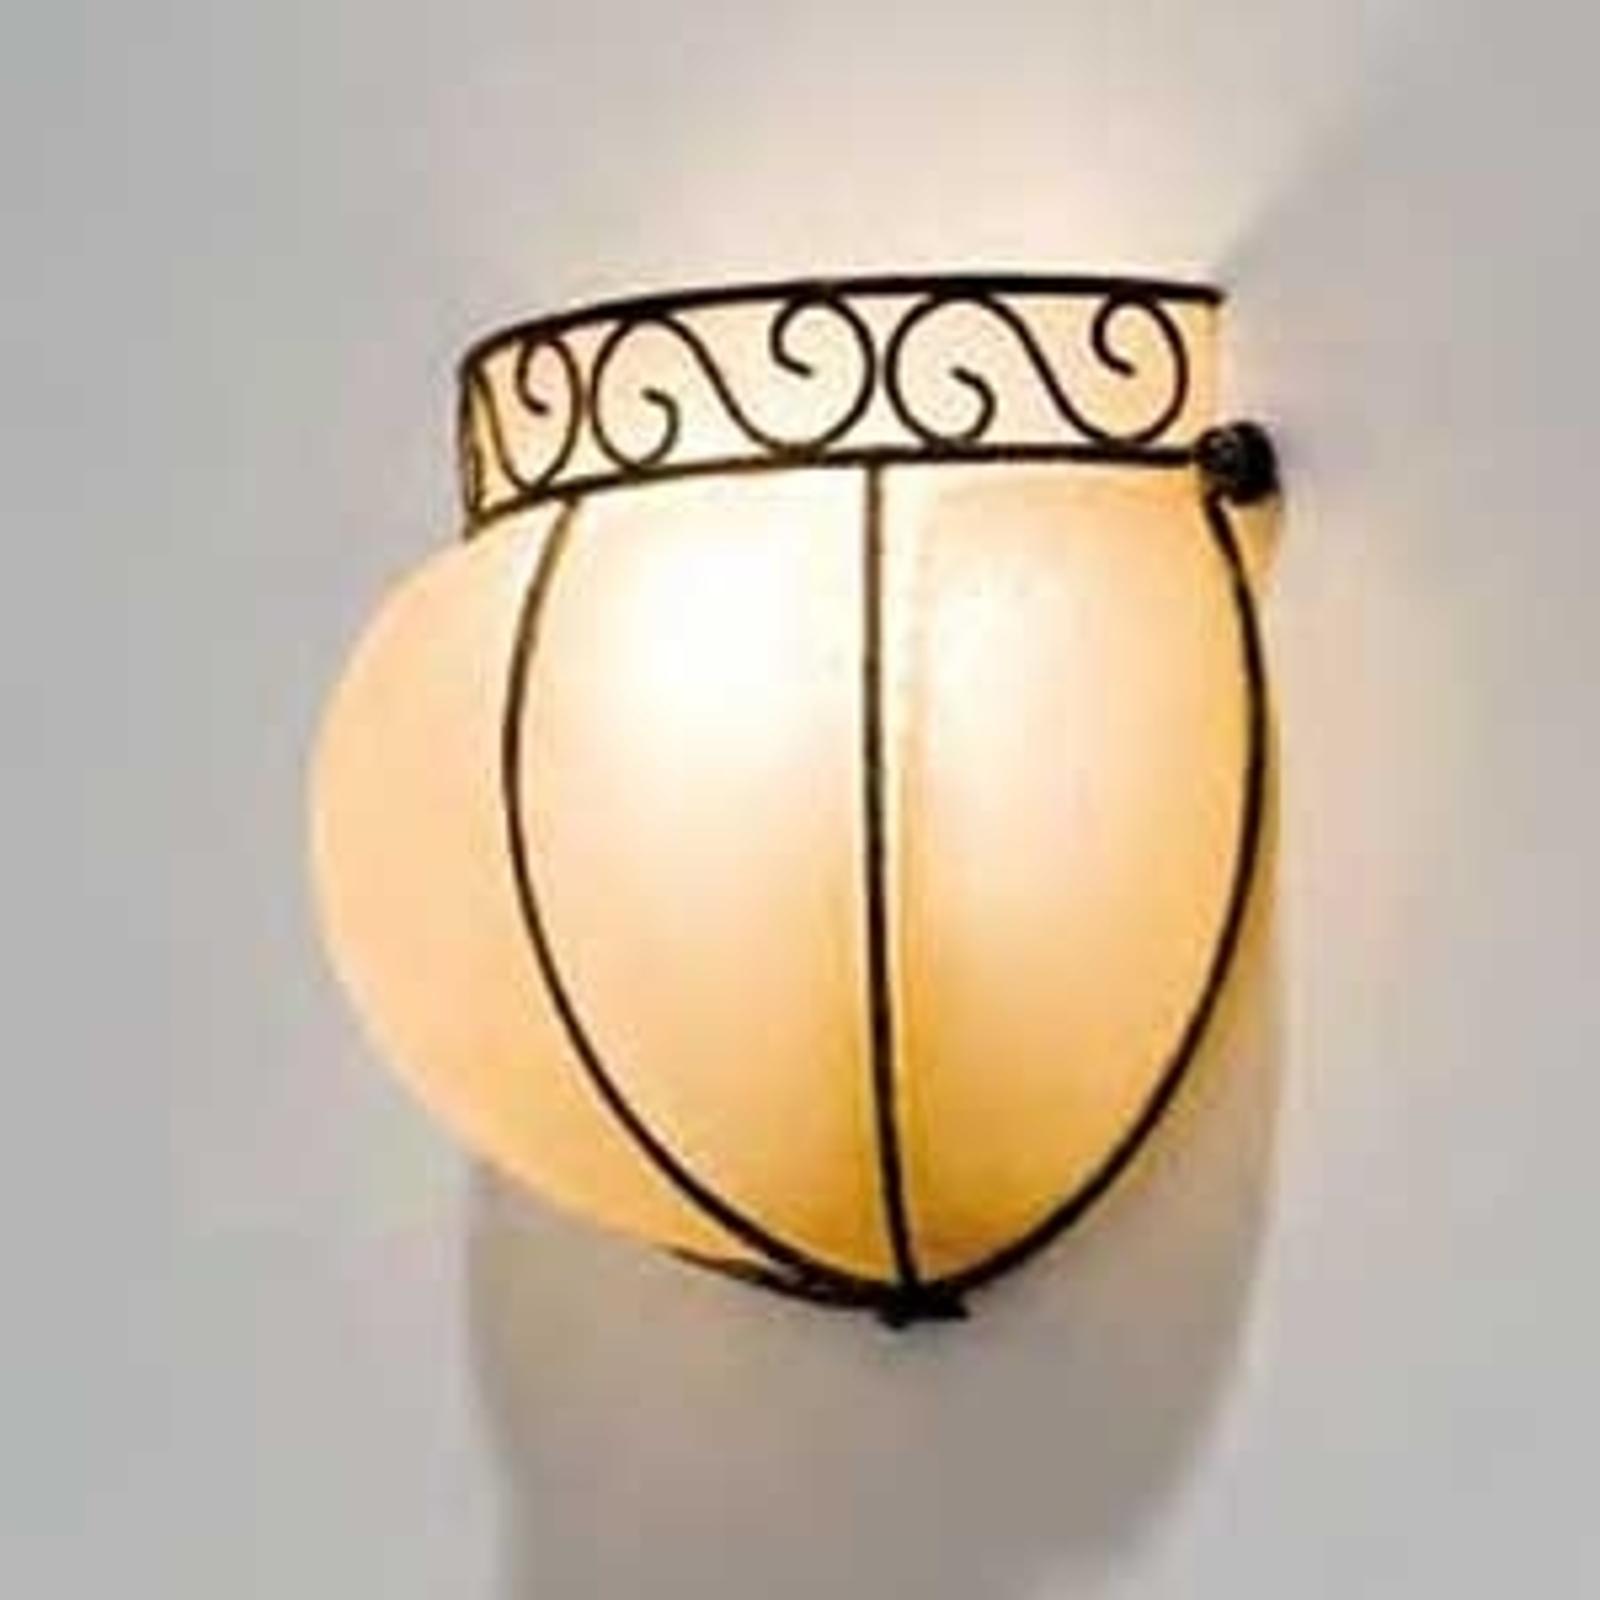 CORONA håndlavet væglampe 16 cm